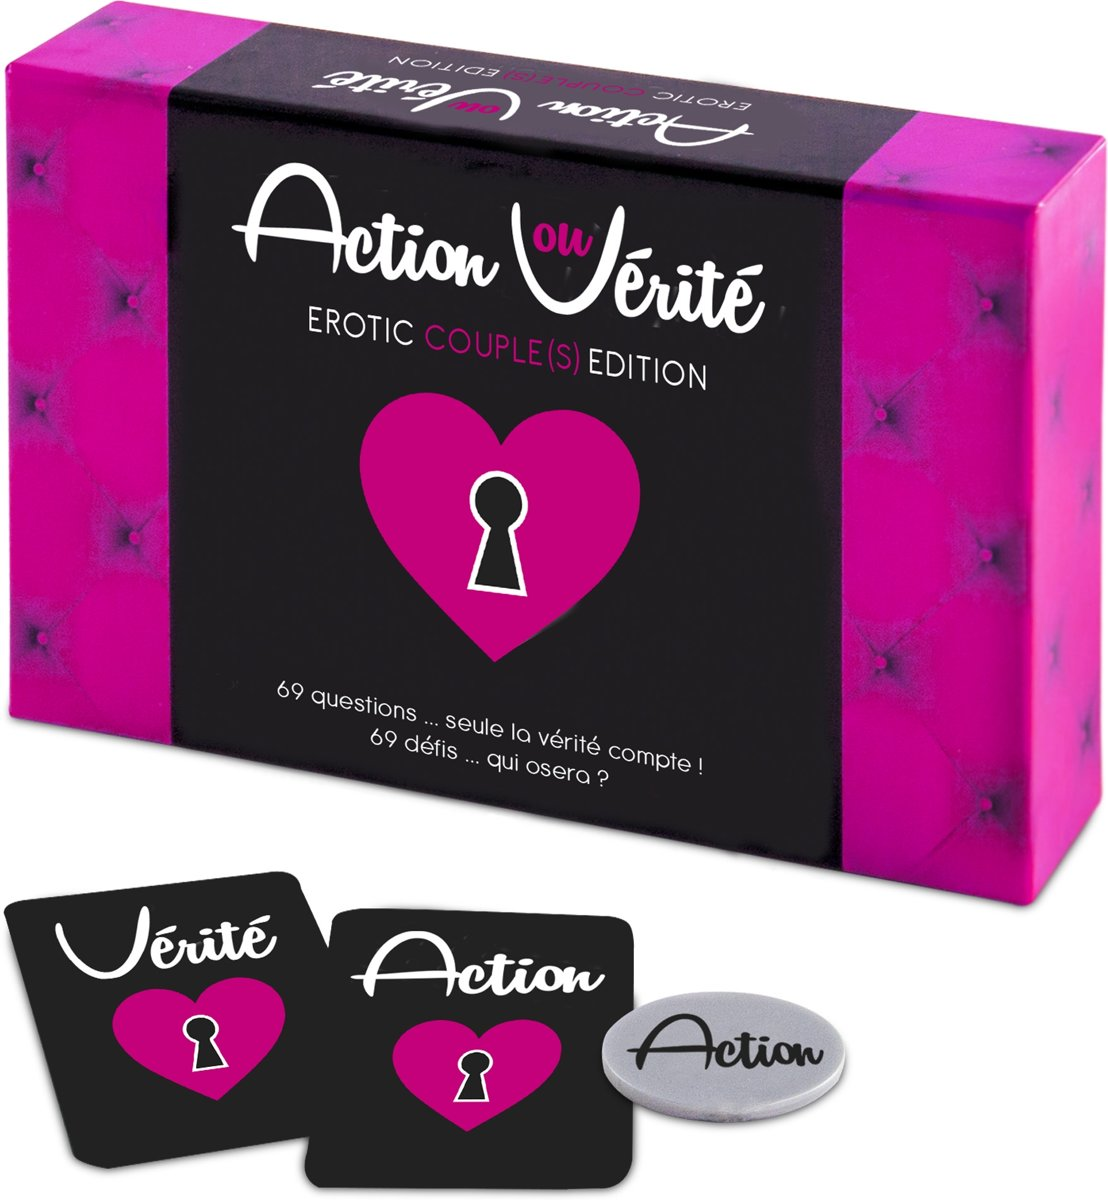 Tease and Please Erotisch Spel Action ou Vérité Couple(s) Edition